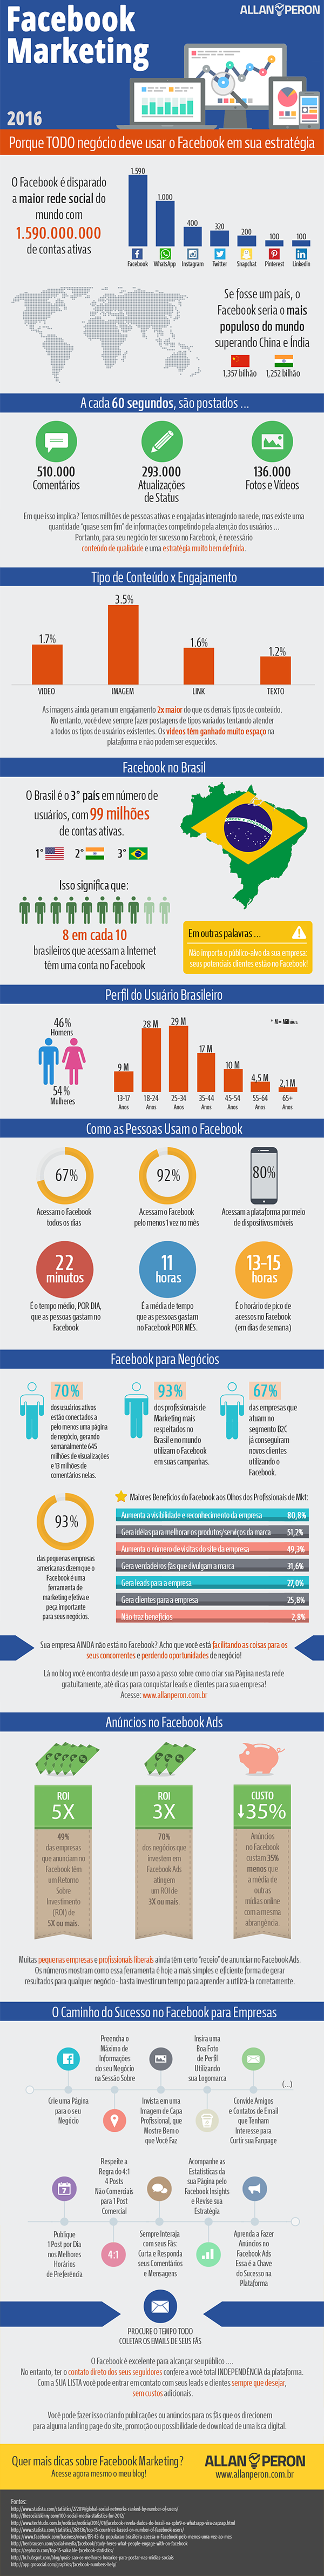 Infográfico Facebook Marketing 2016